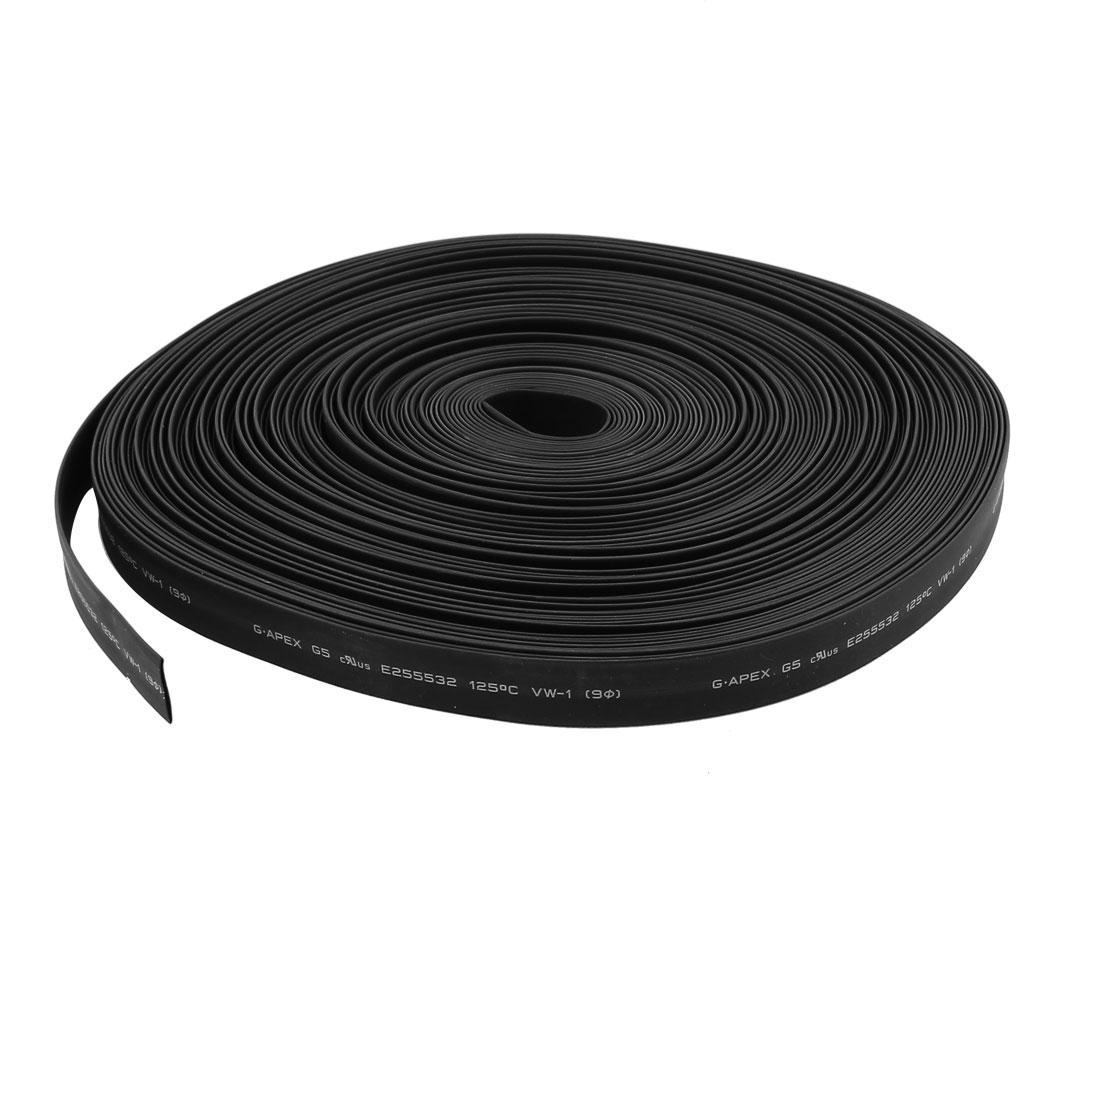 30m 9mm Dia Insulated PE Heat Shrink Tubing 2:1 Shrinkage Ratio Waterproof Black